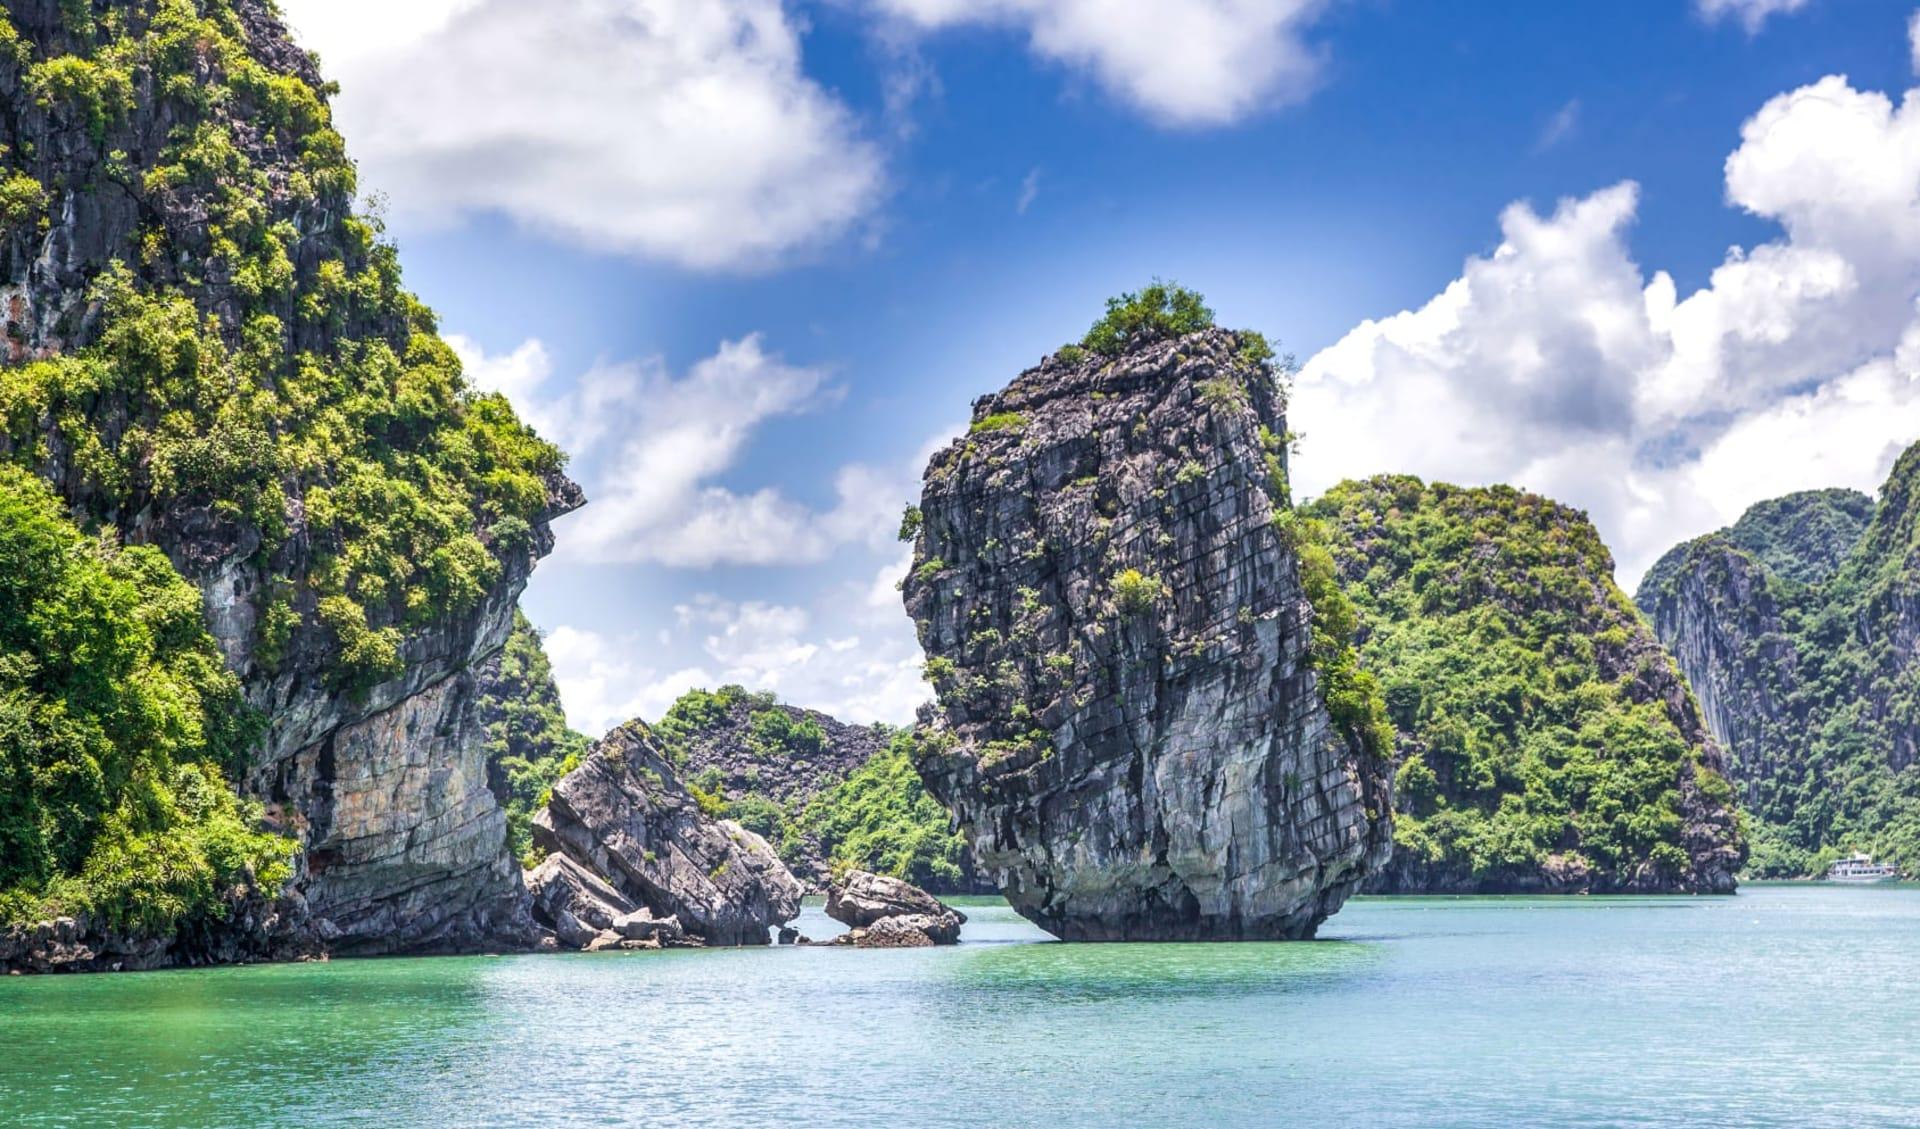 Halong Bucht Kreuzfahrten mit «Legend Halong» Privatboot ab Hanoi: Halong Bay cruising among beautiful limestone rocks and secluded beaches